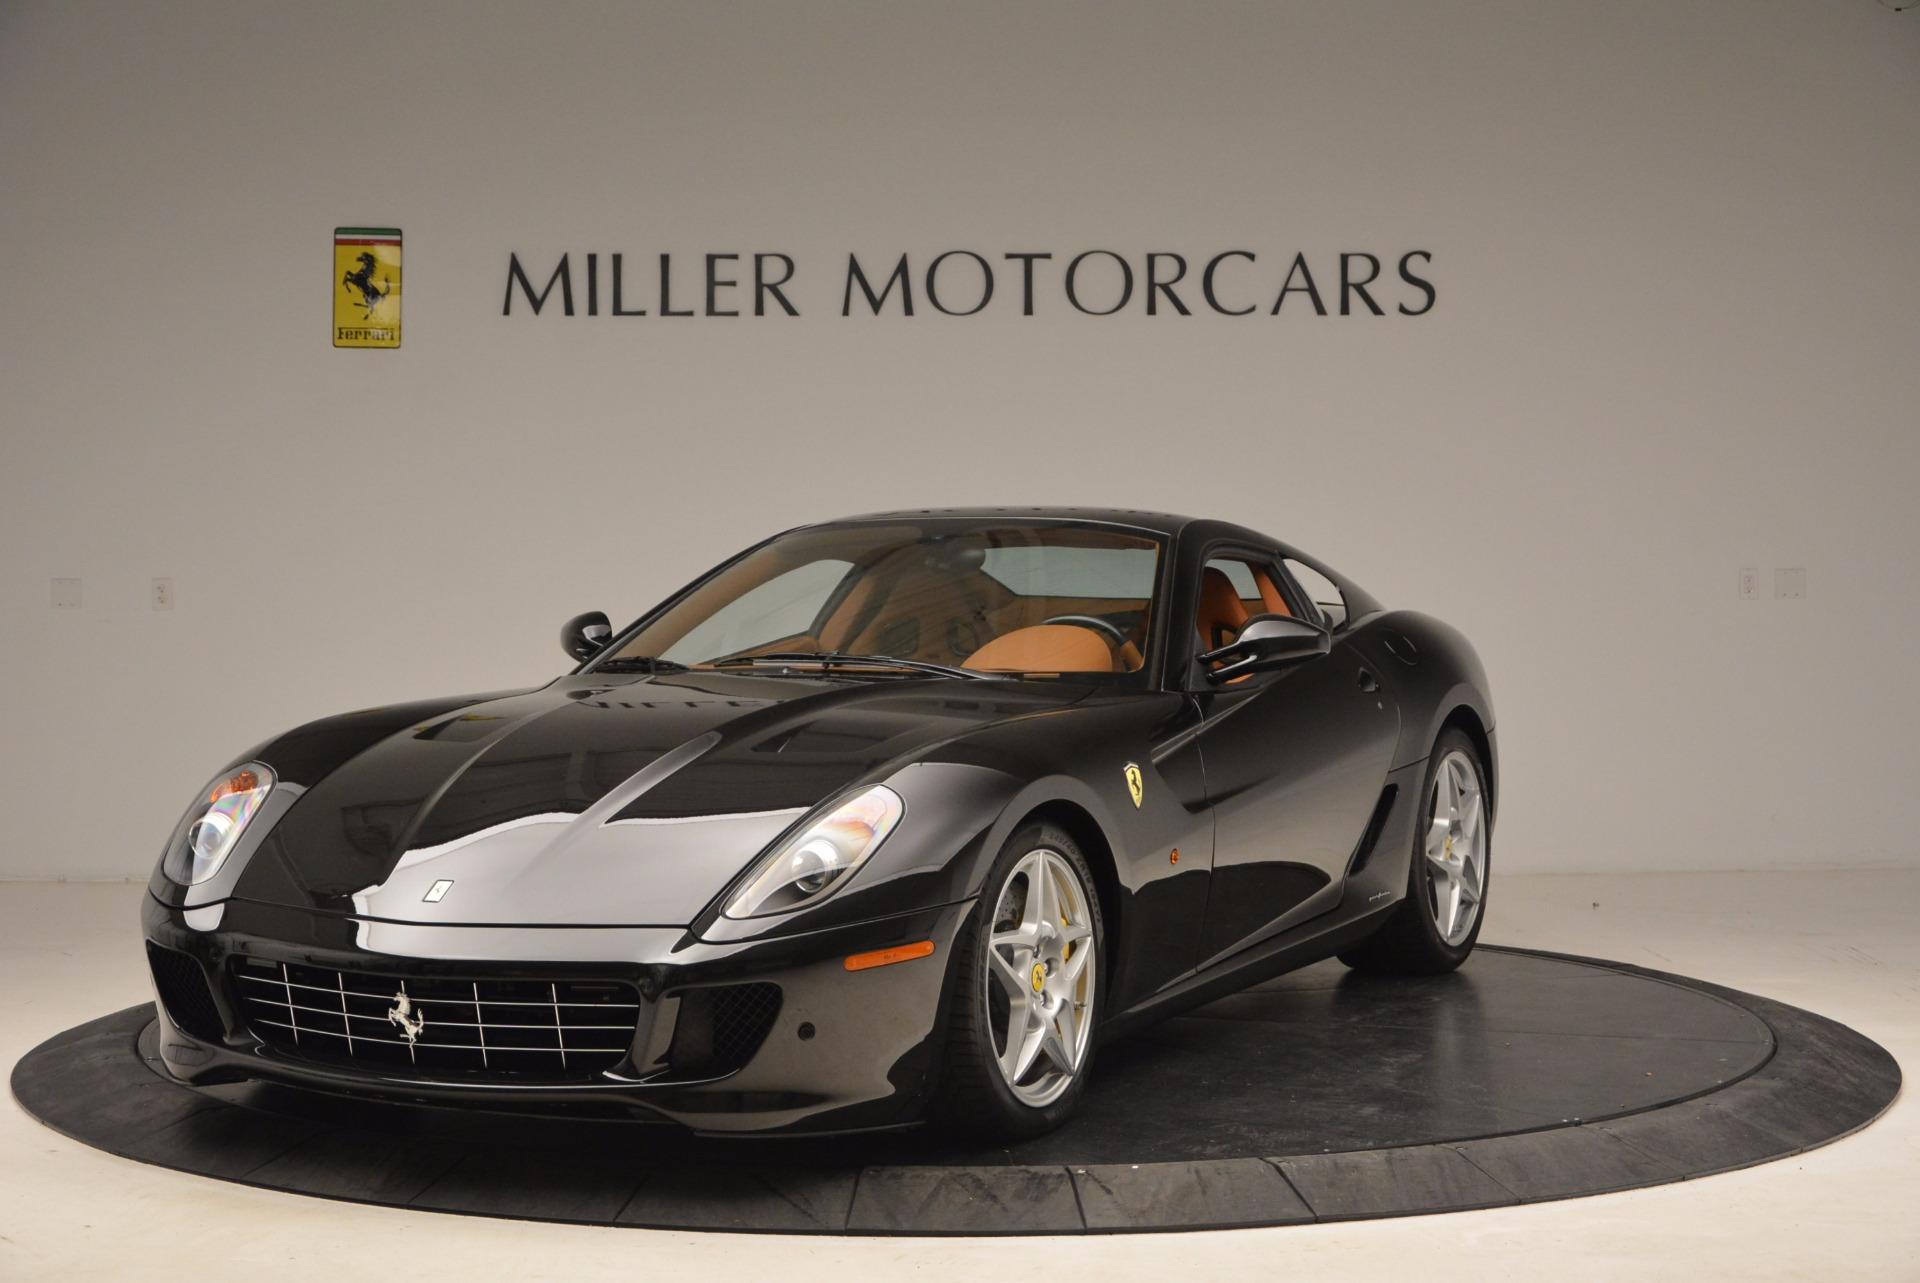 Used 2008 Ferrari 599 GTB Fiorano for sale Sold at McLaren Greenwich in Greenwich CT 06830 1